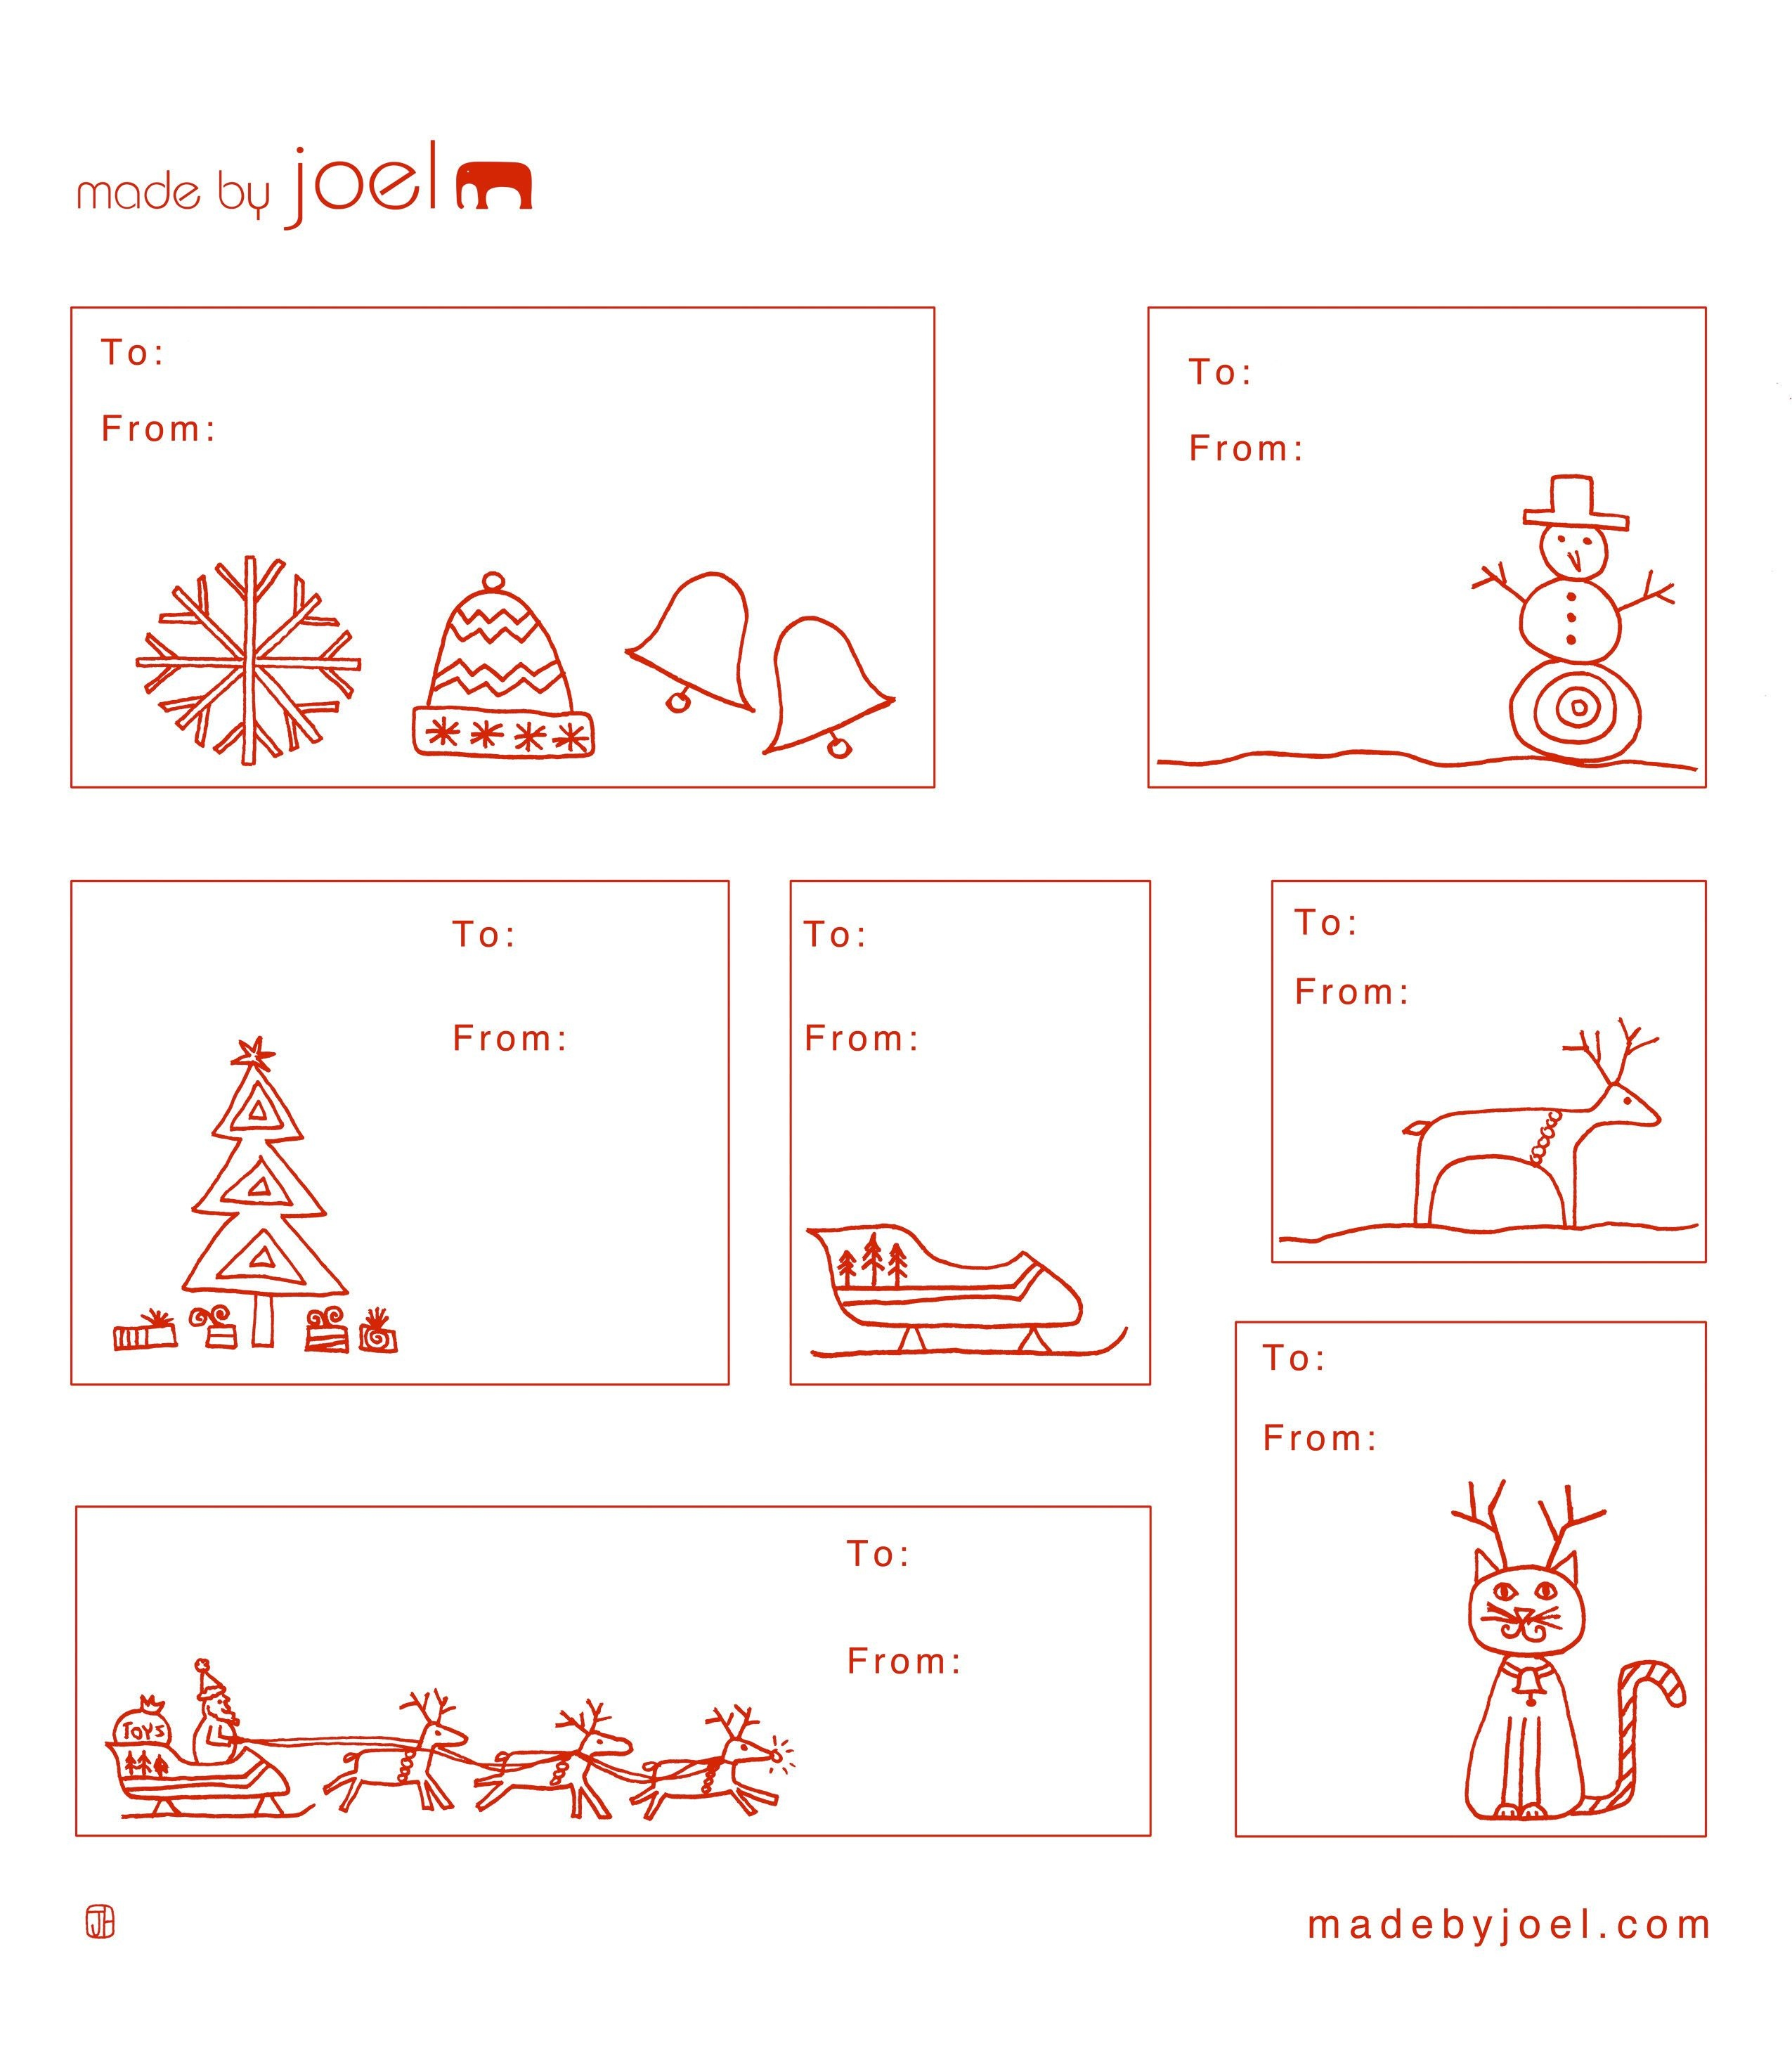 Free Printable: Madejoel » Holiday Gift Tag Templates - Free Printable To From Gift Tags